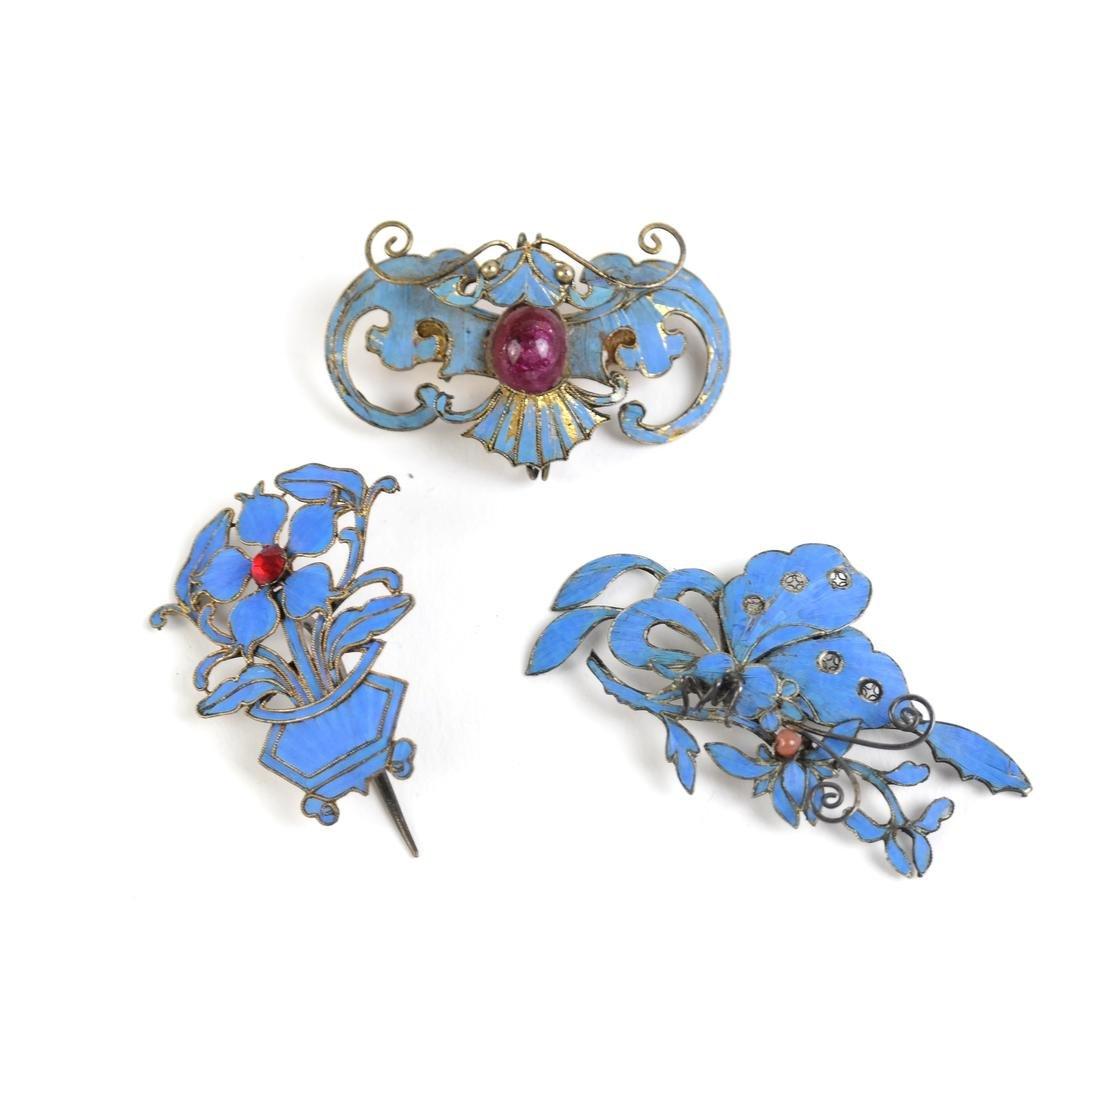 Chinese Kingfisher Hairpins